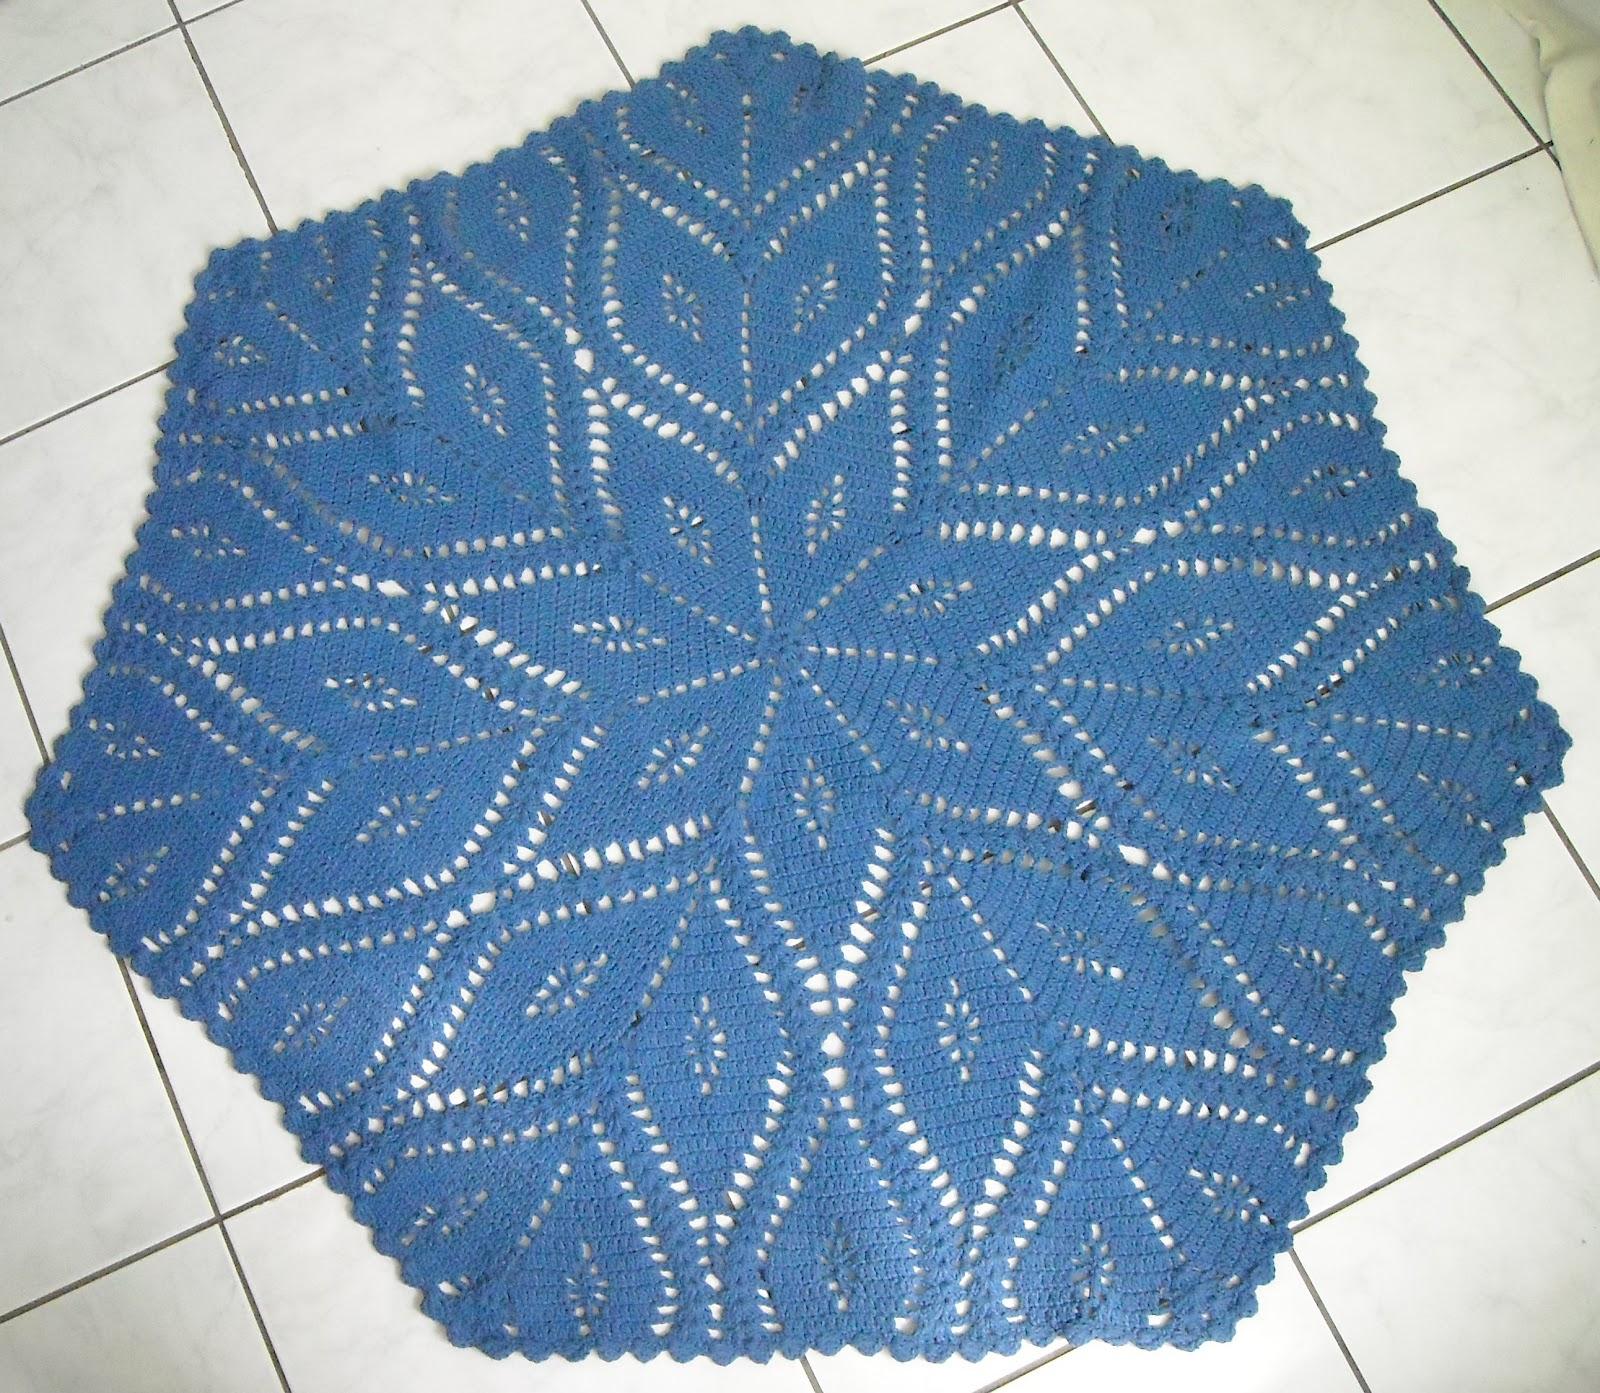 os croches da elsa tapete sextavado